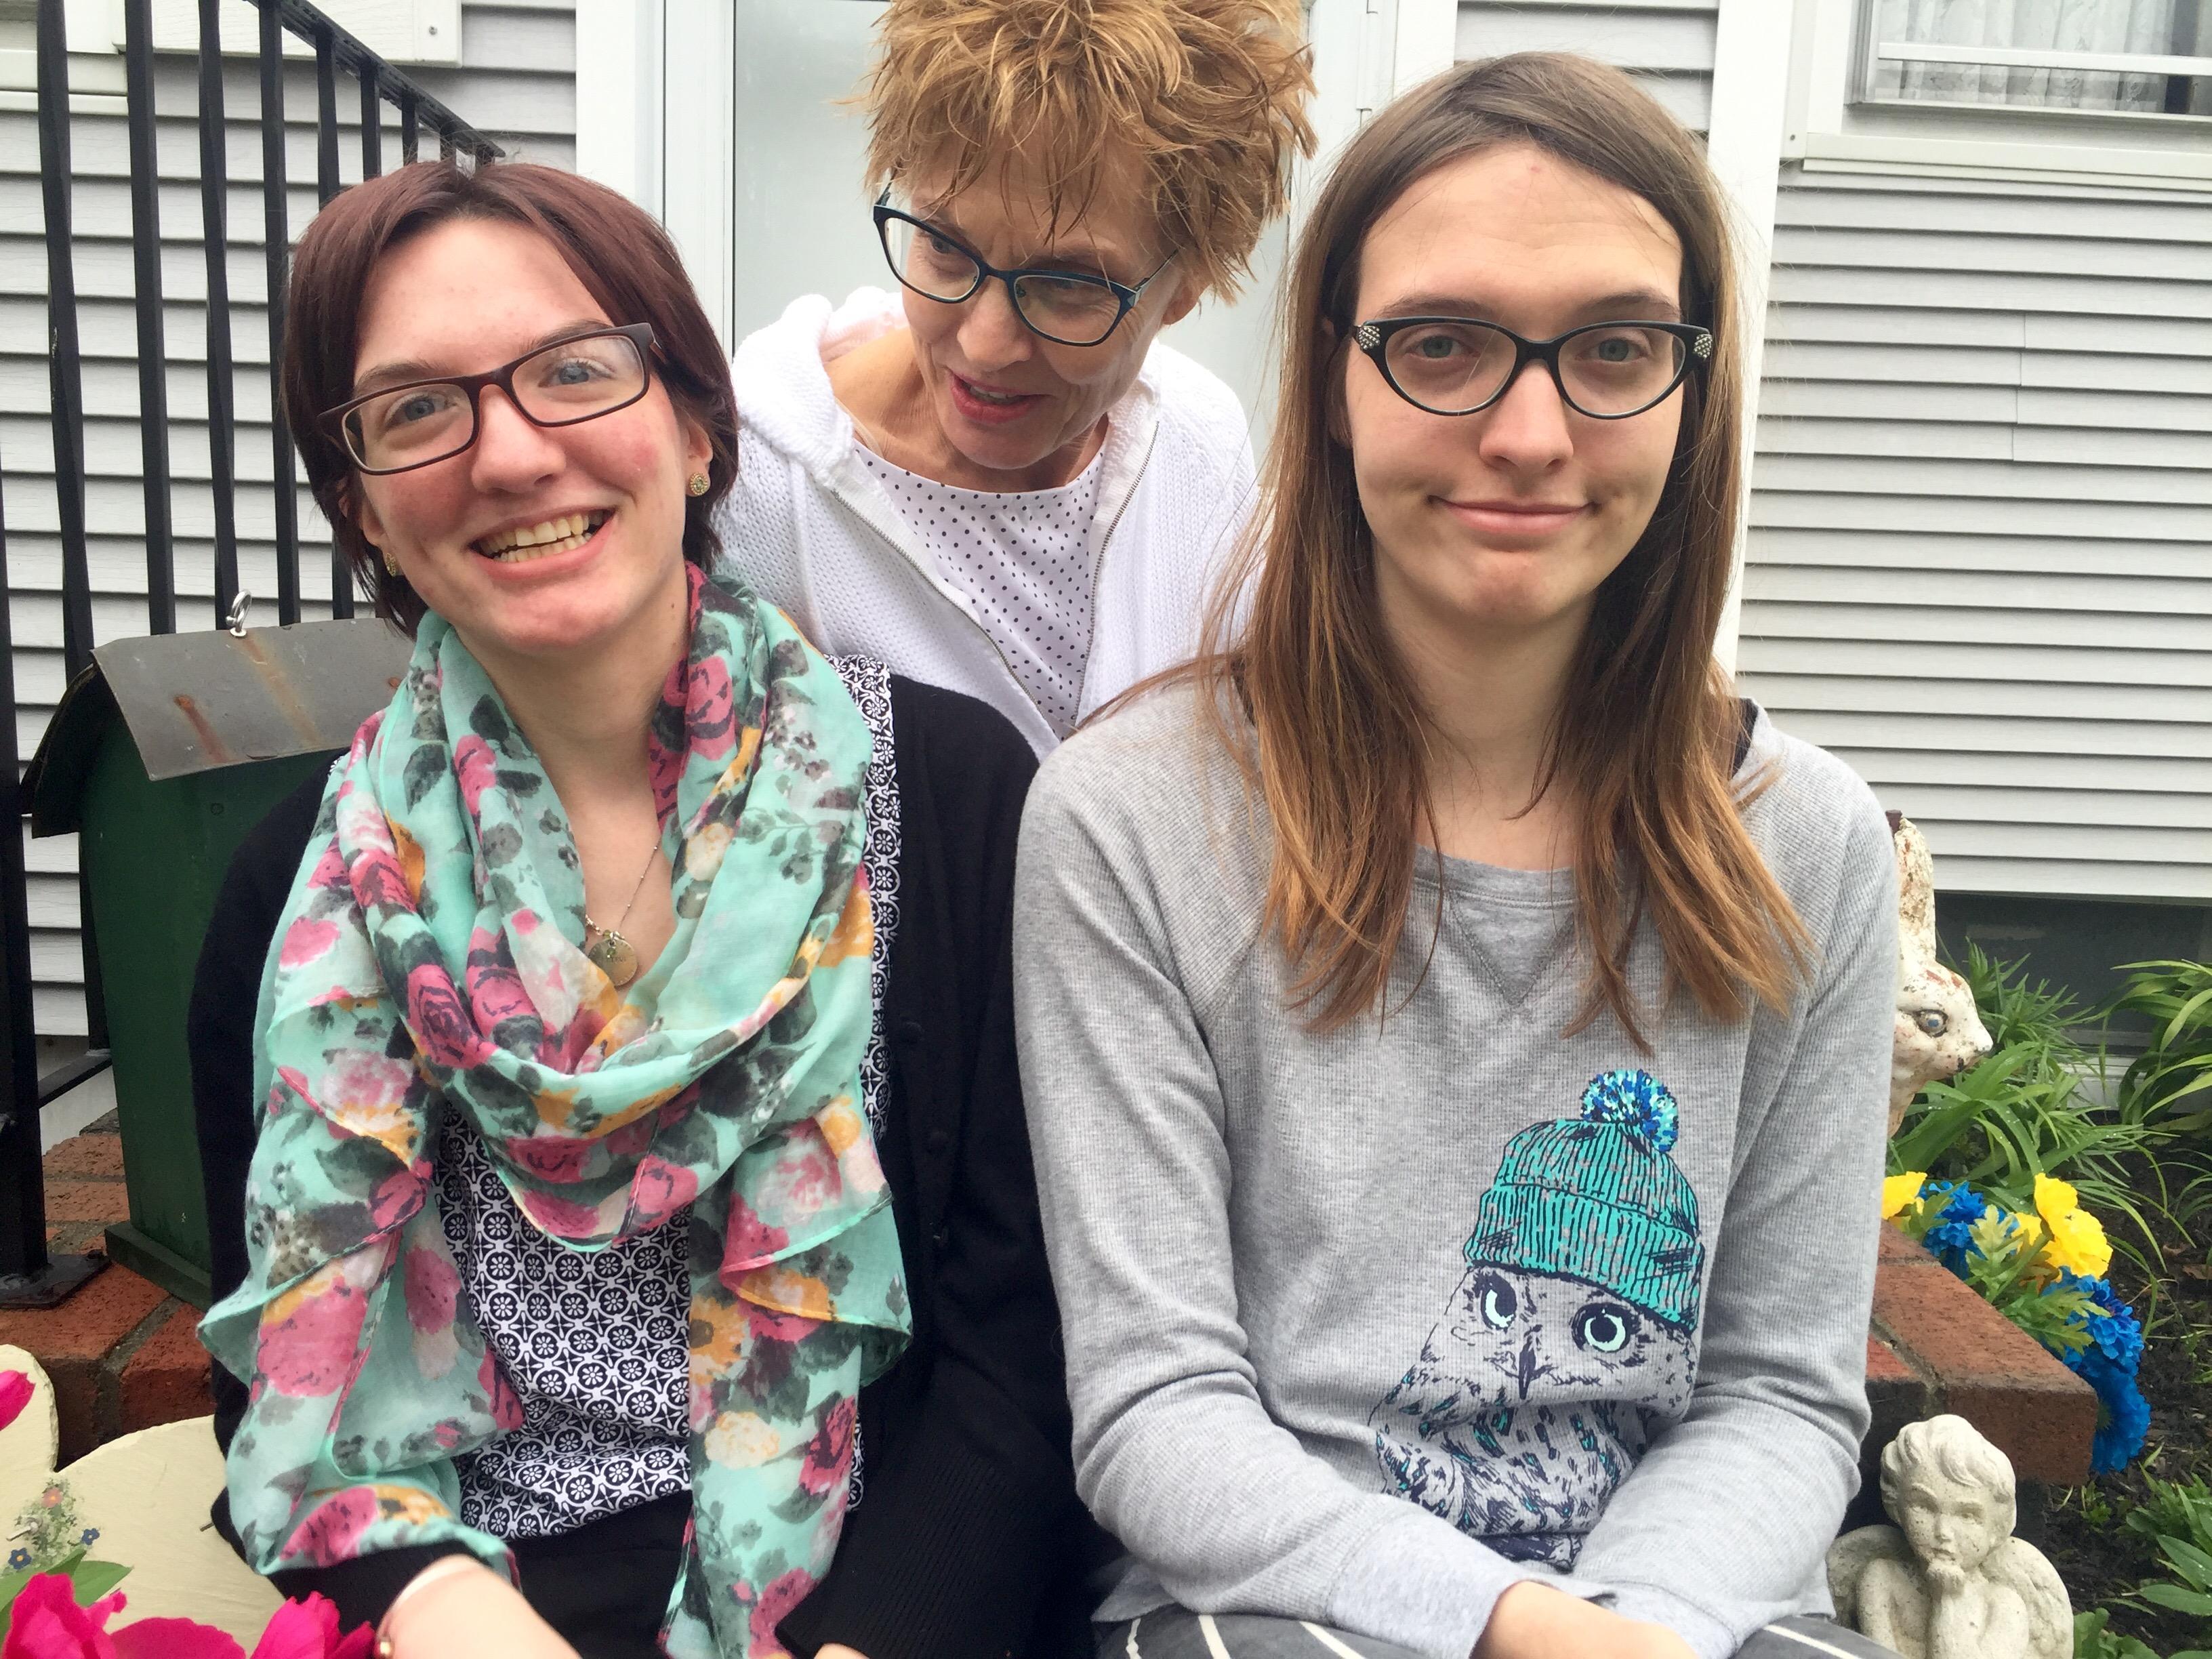 Caption: Diane with her daughters, Ellie & Jayden, Credit: Ellery Lamm